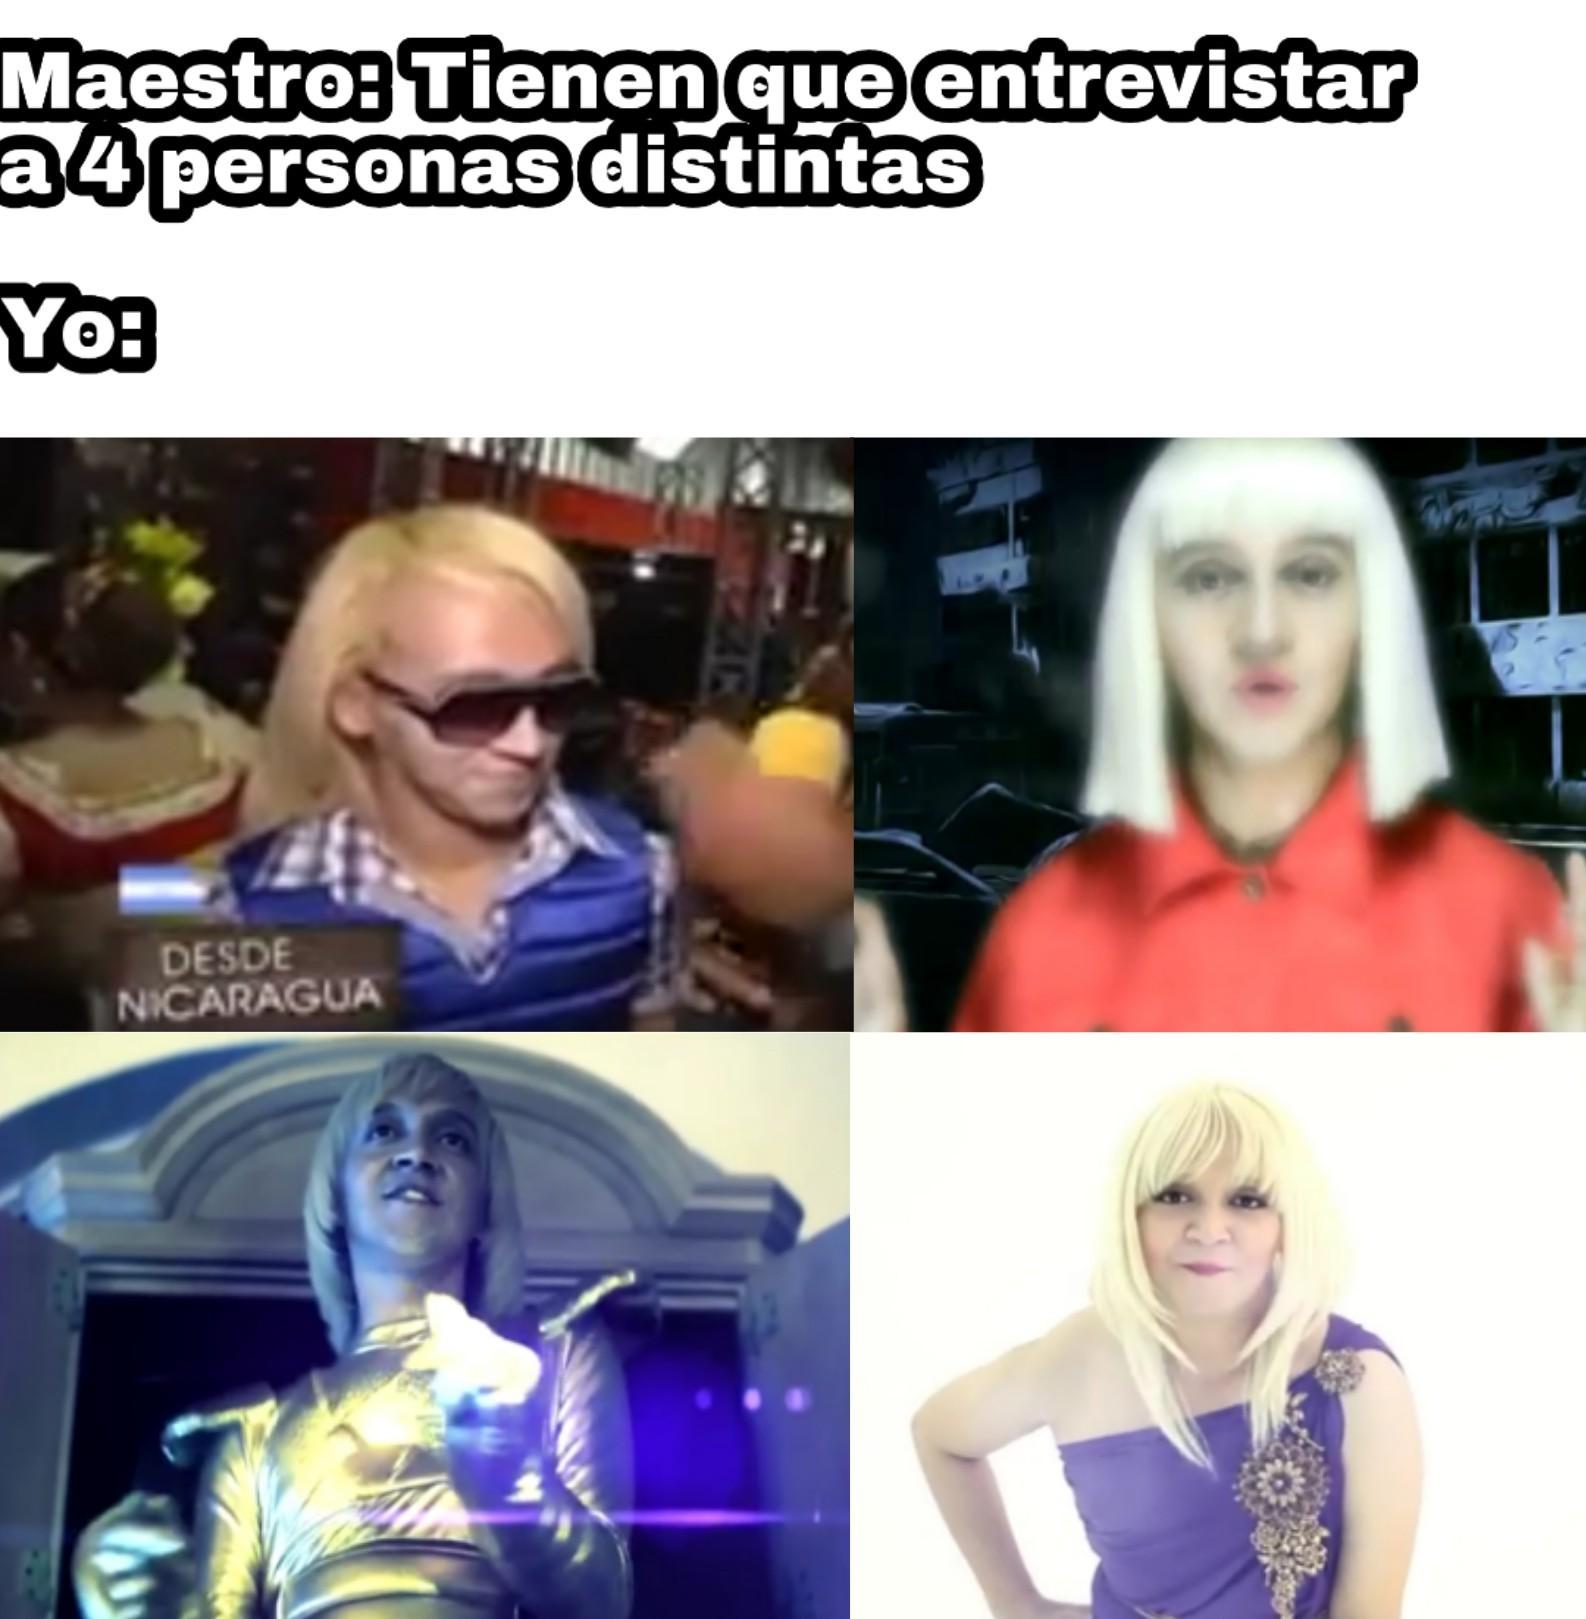 El alien travesti ese xd - meme